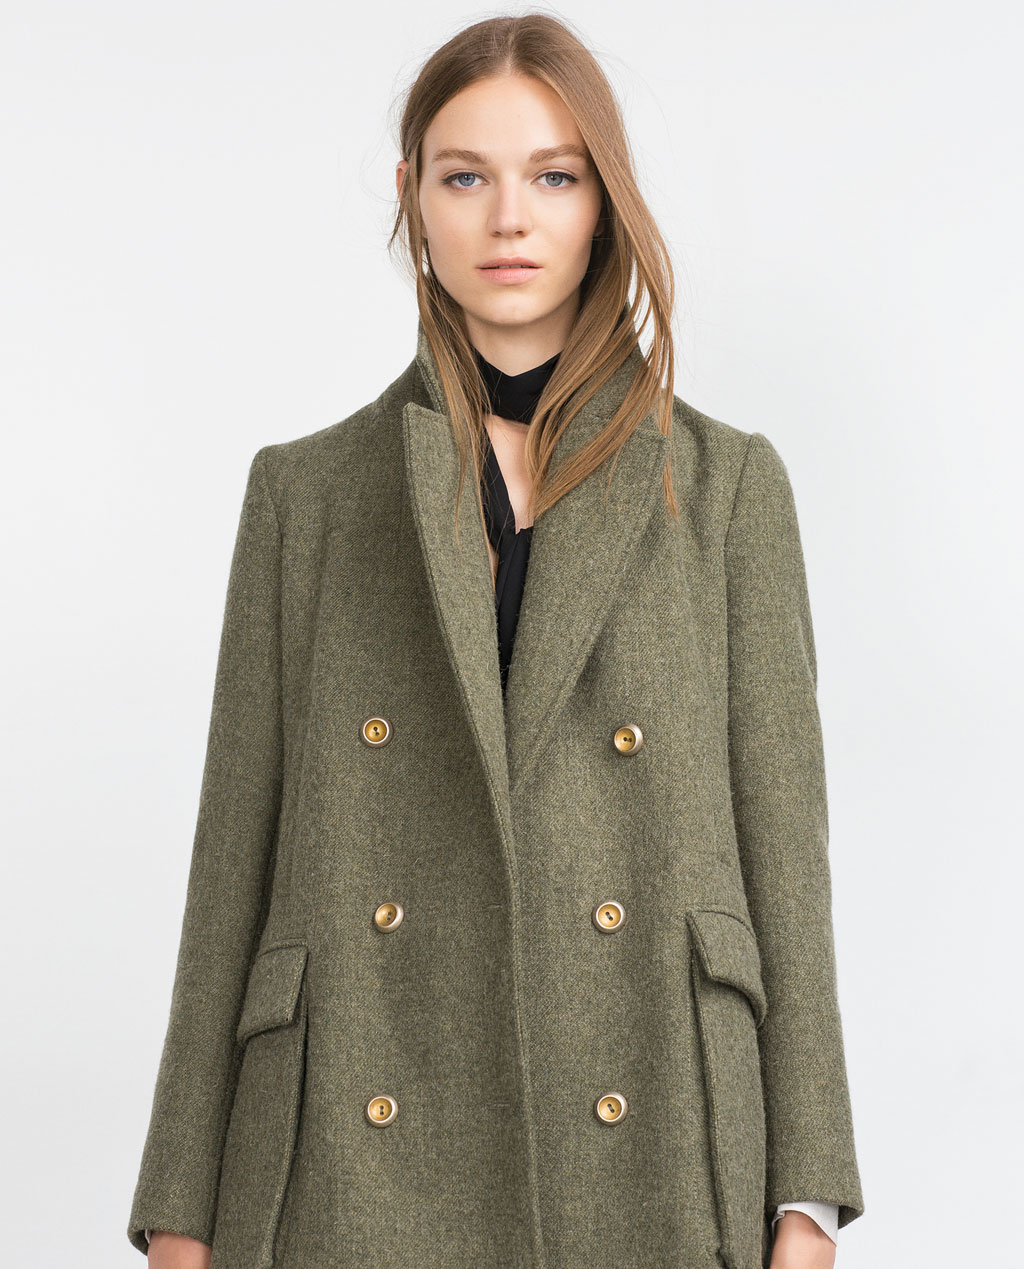 The Big Coat Edit - The Frugality Blog